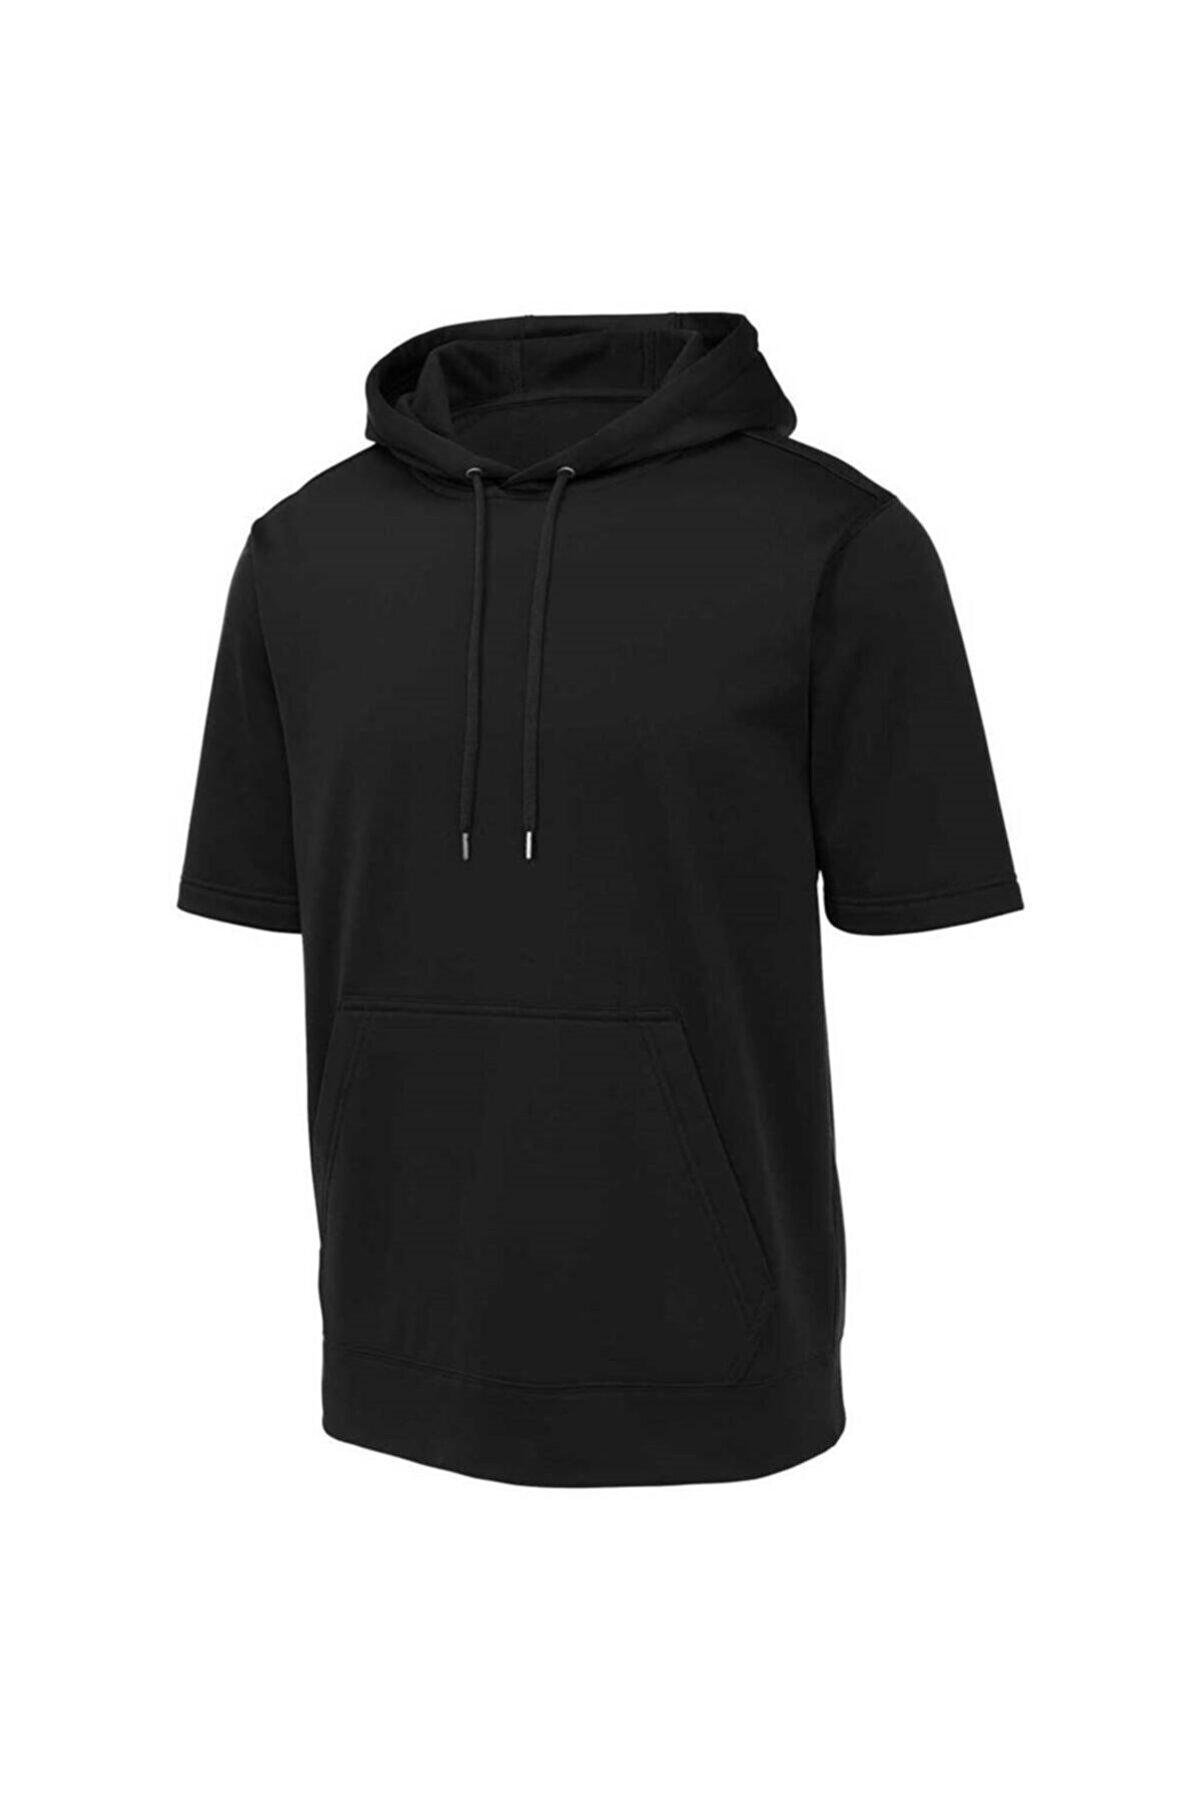 miracolomoda Unisex Siyah Kapüşonlu Kanguru Cepli Kısa Kollu Half Sweatshirt